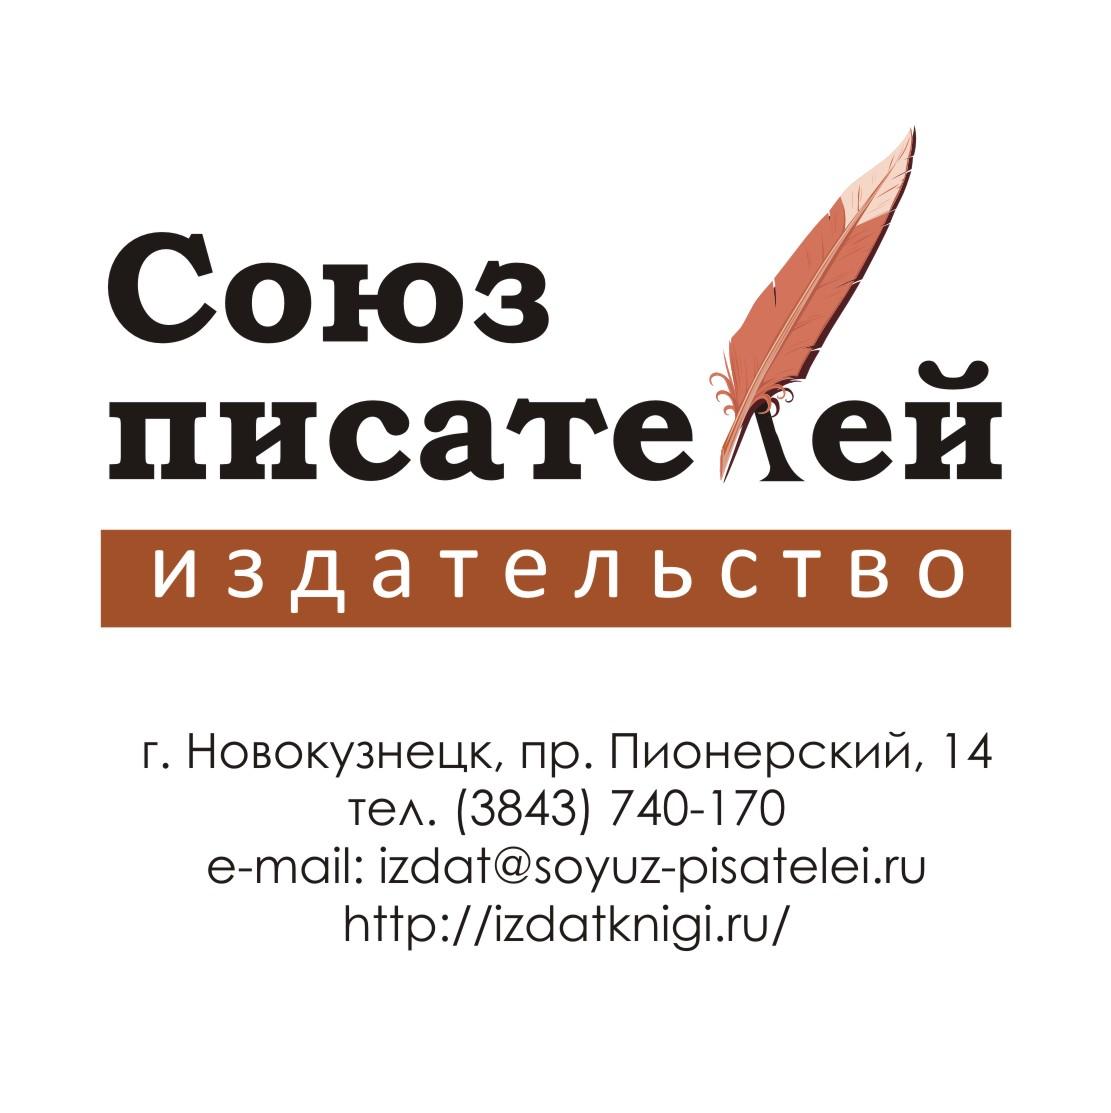 http://soyuz-pisatelei.ru/news/2015-10-06-1231